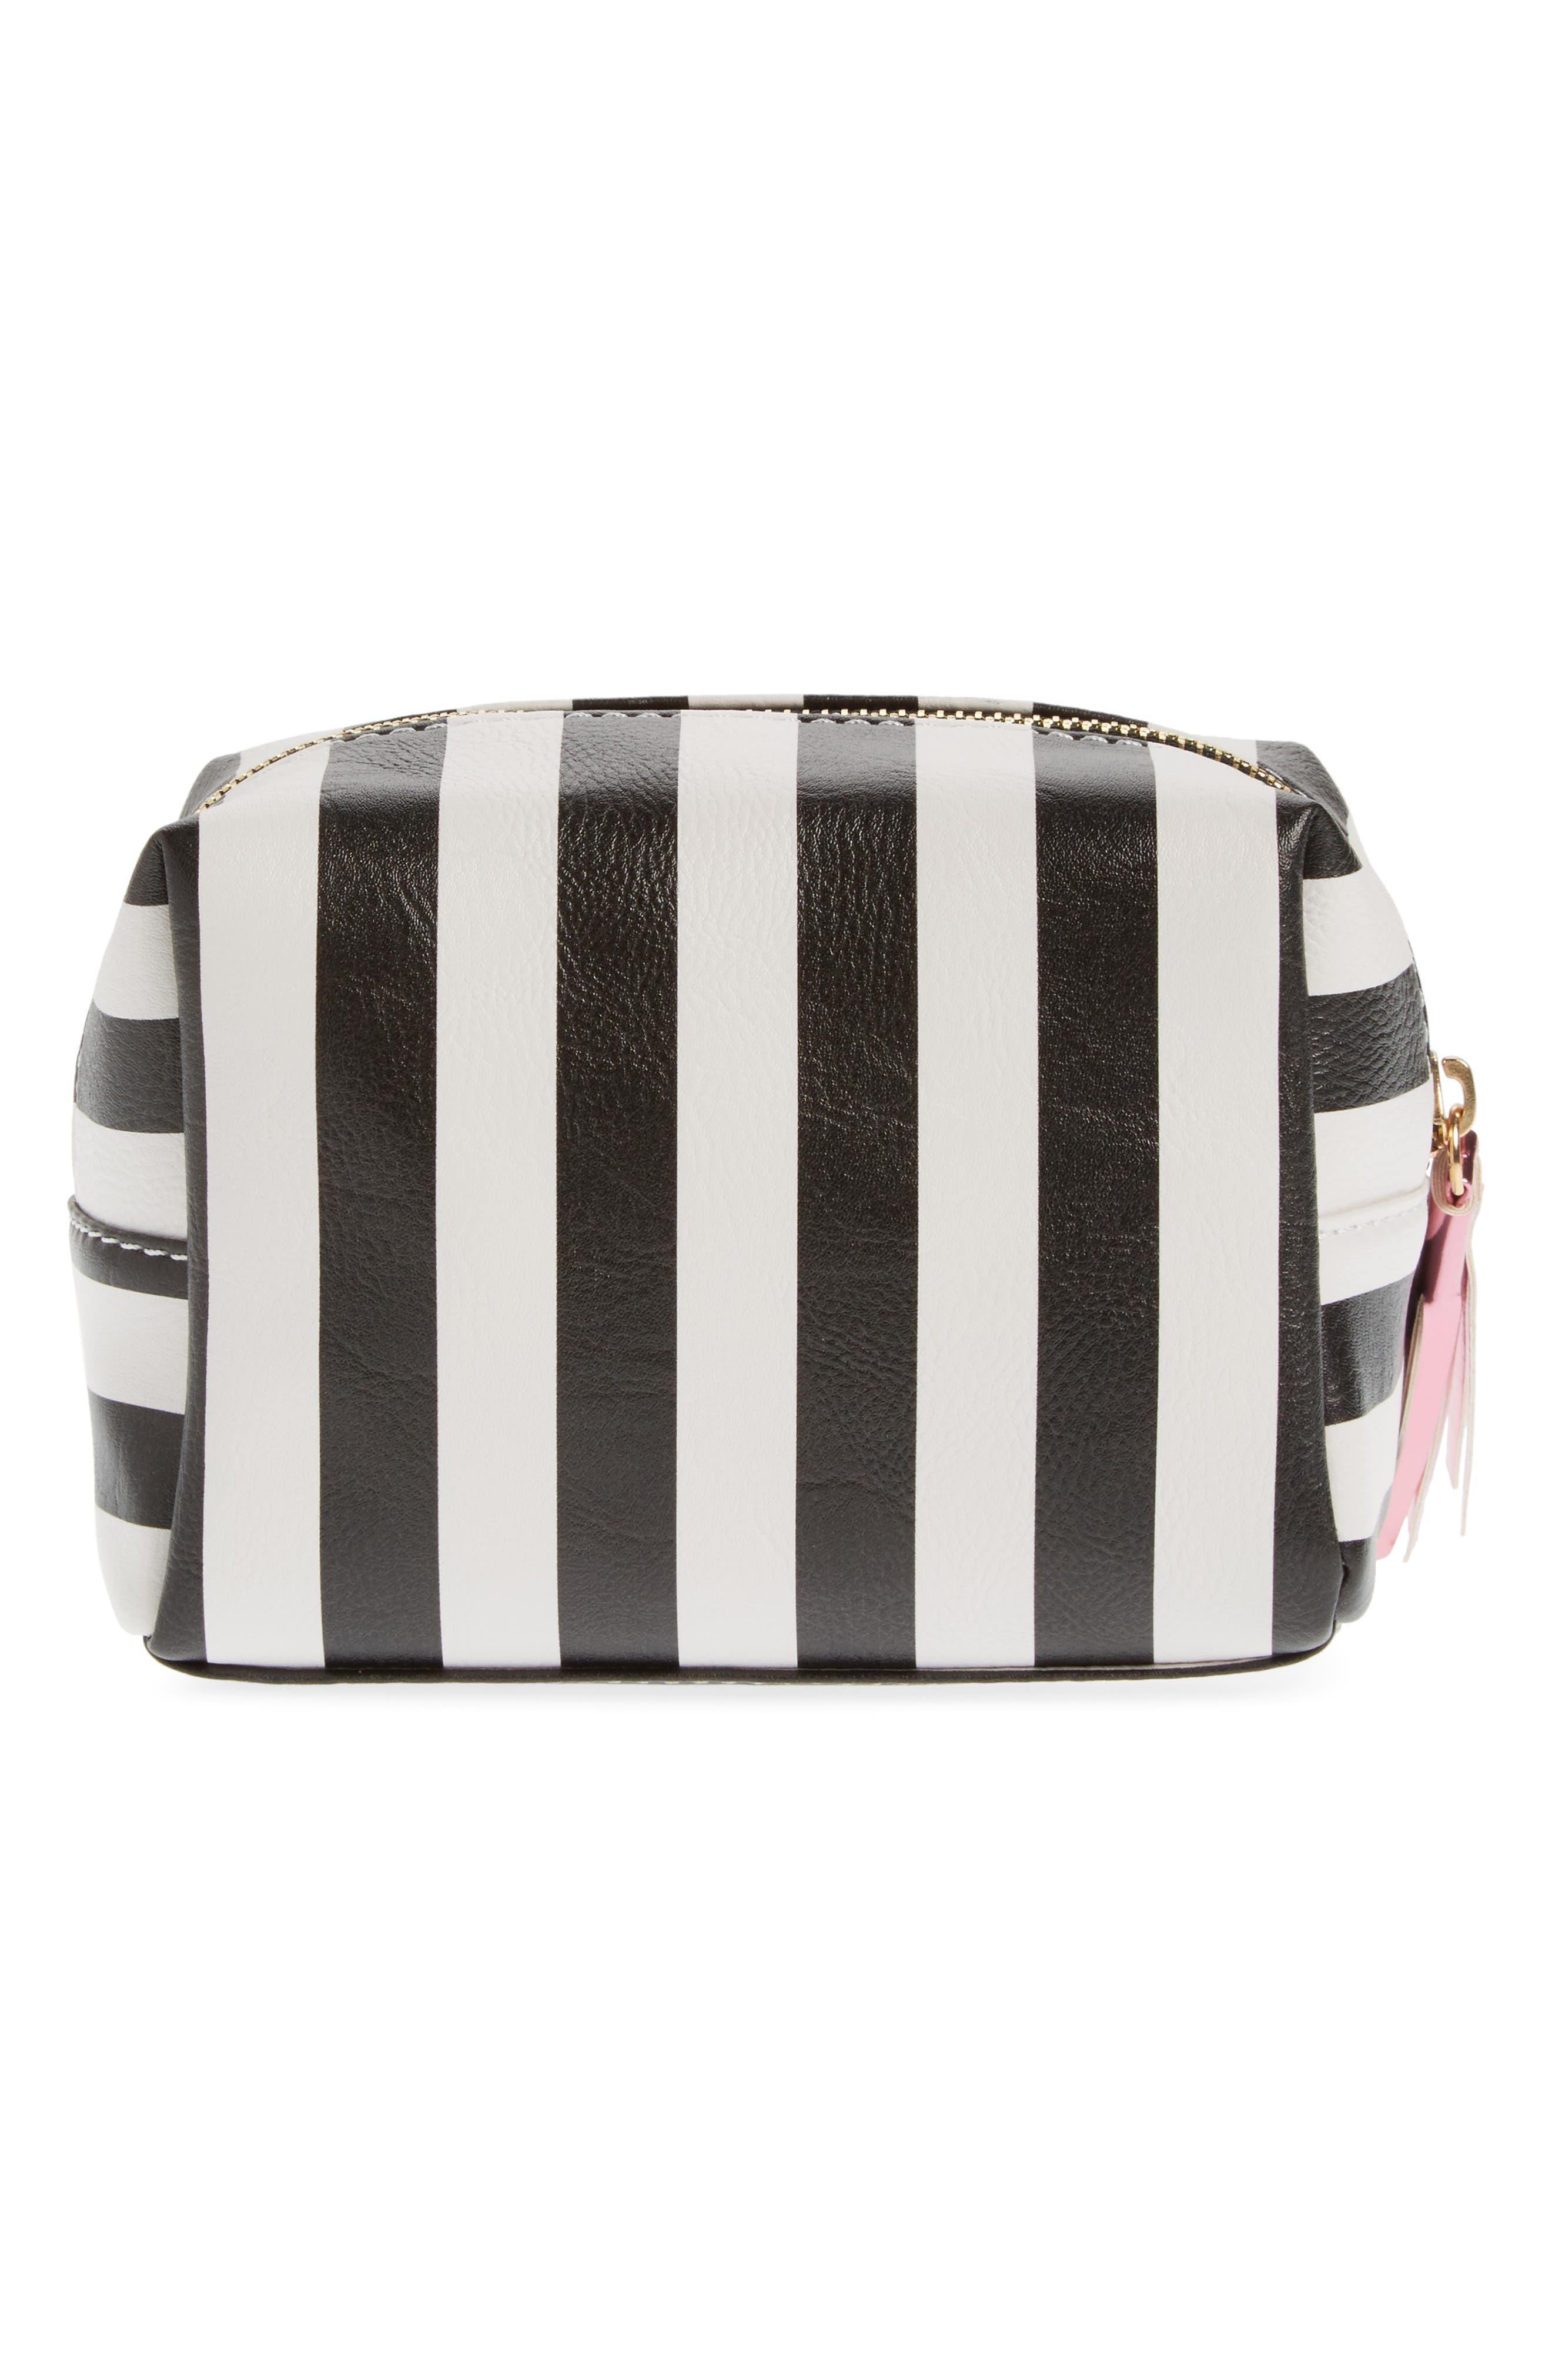 Metallic Lip Stripe Cosmetics Bag,                             Alternate thumbnail 2, color,                             Black/ White